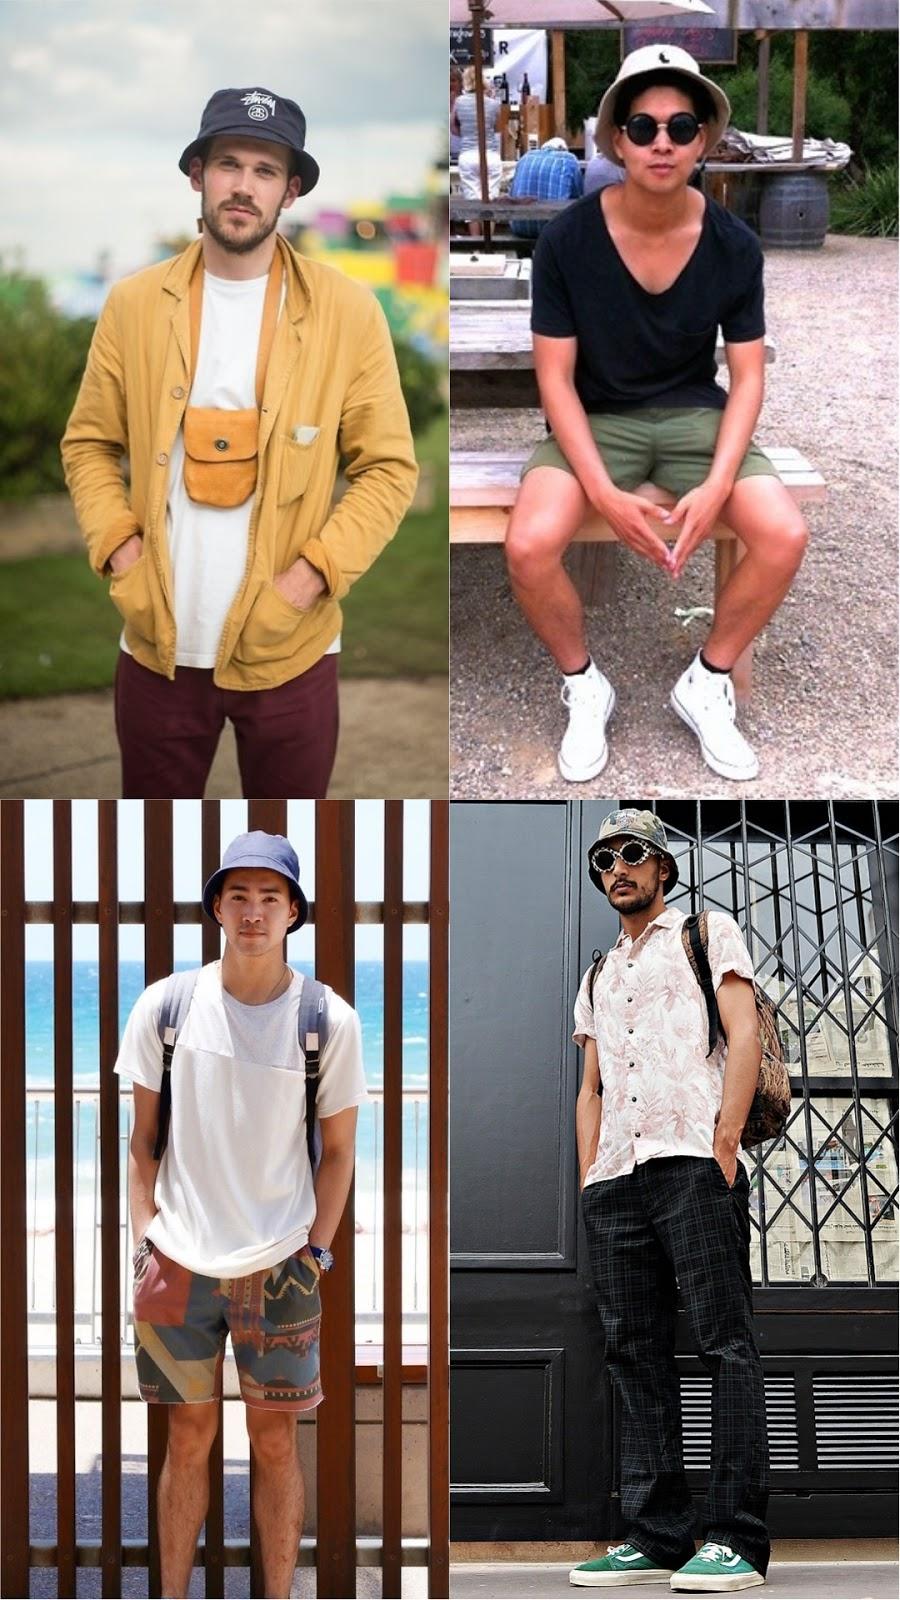 tendencias-moda-masculina-primavera-verao-2019-blog-tres-chic-bucket-hat-chapeu-cata-ovo